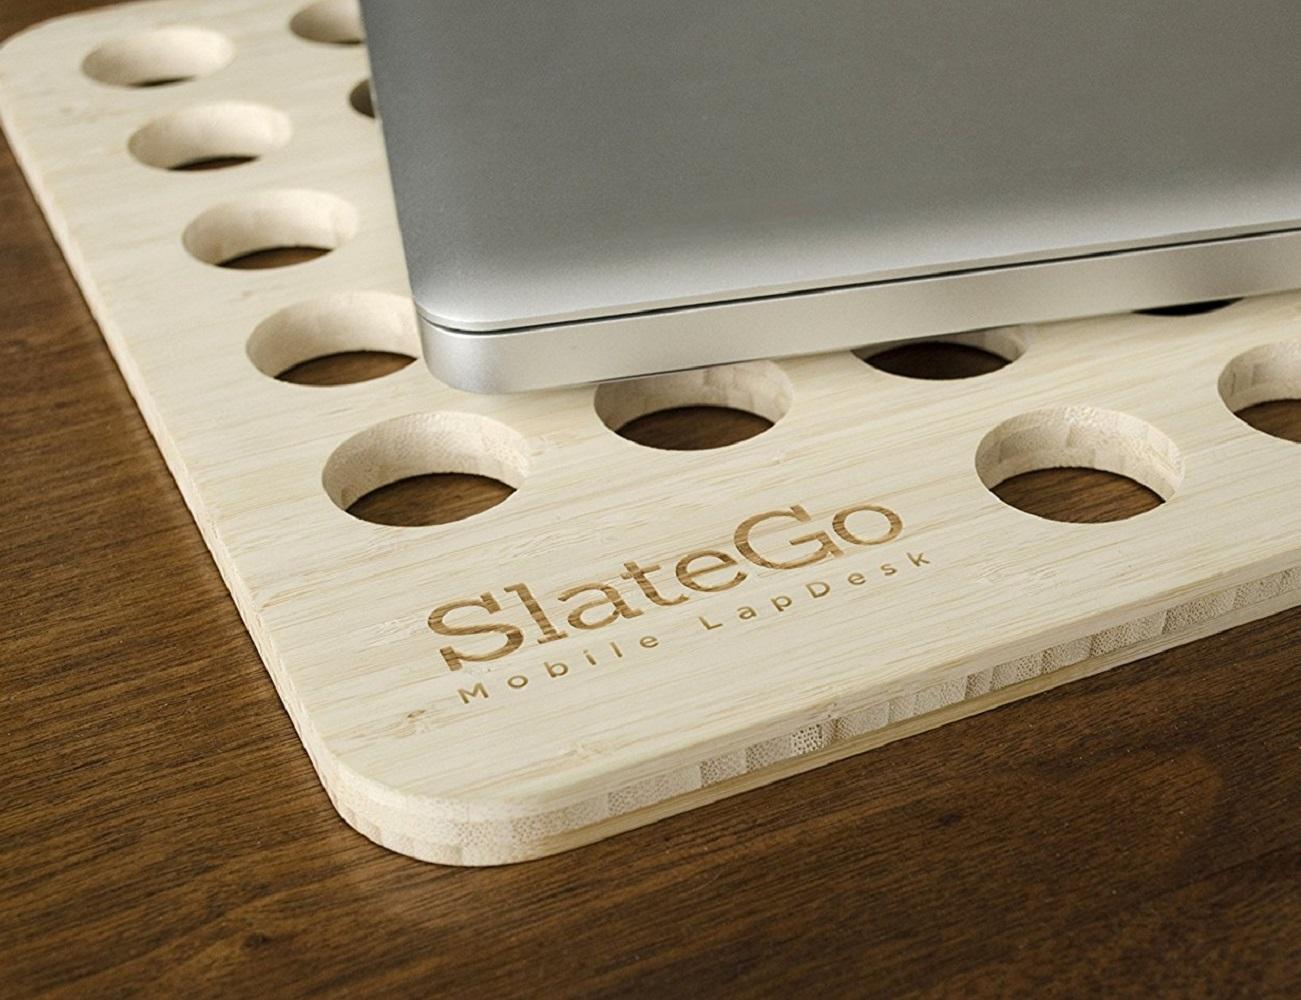 SlateGo